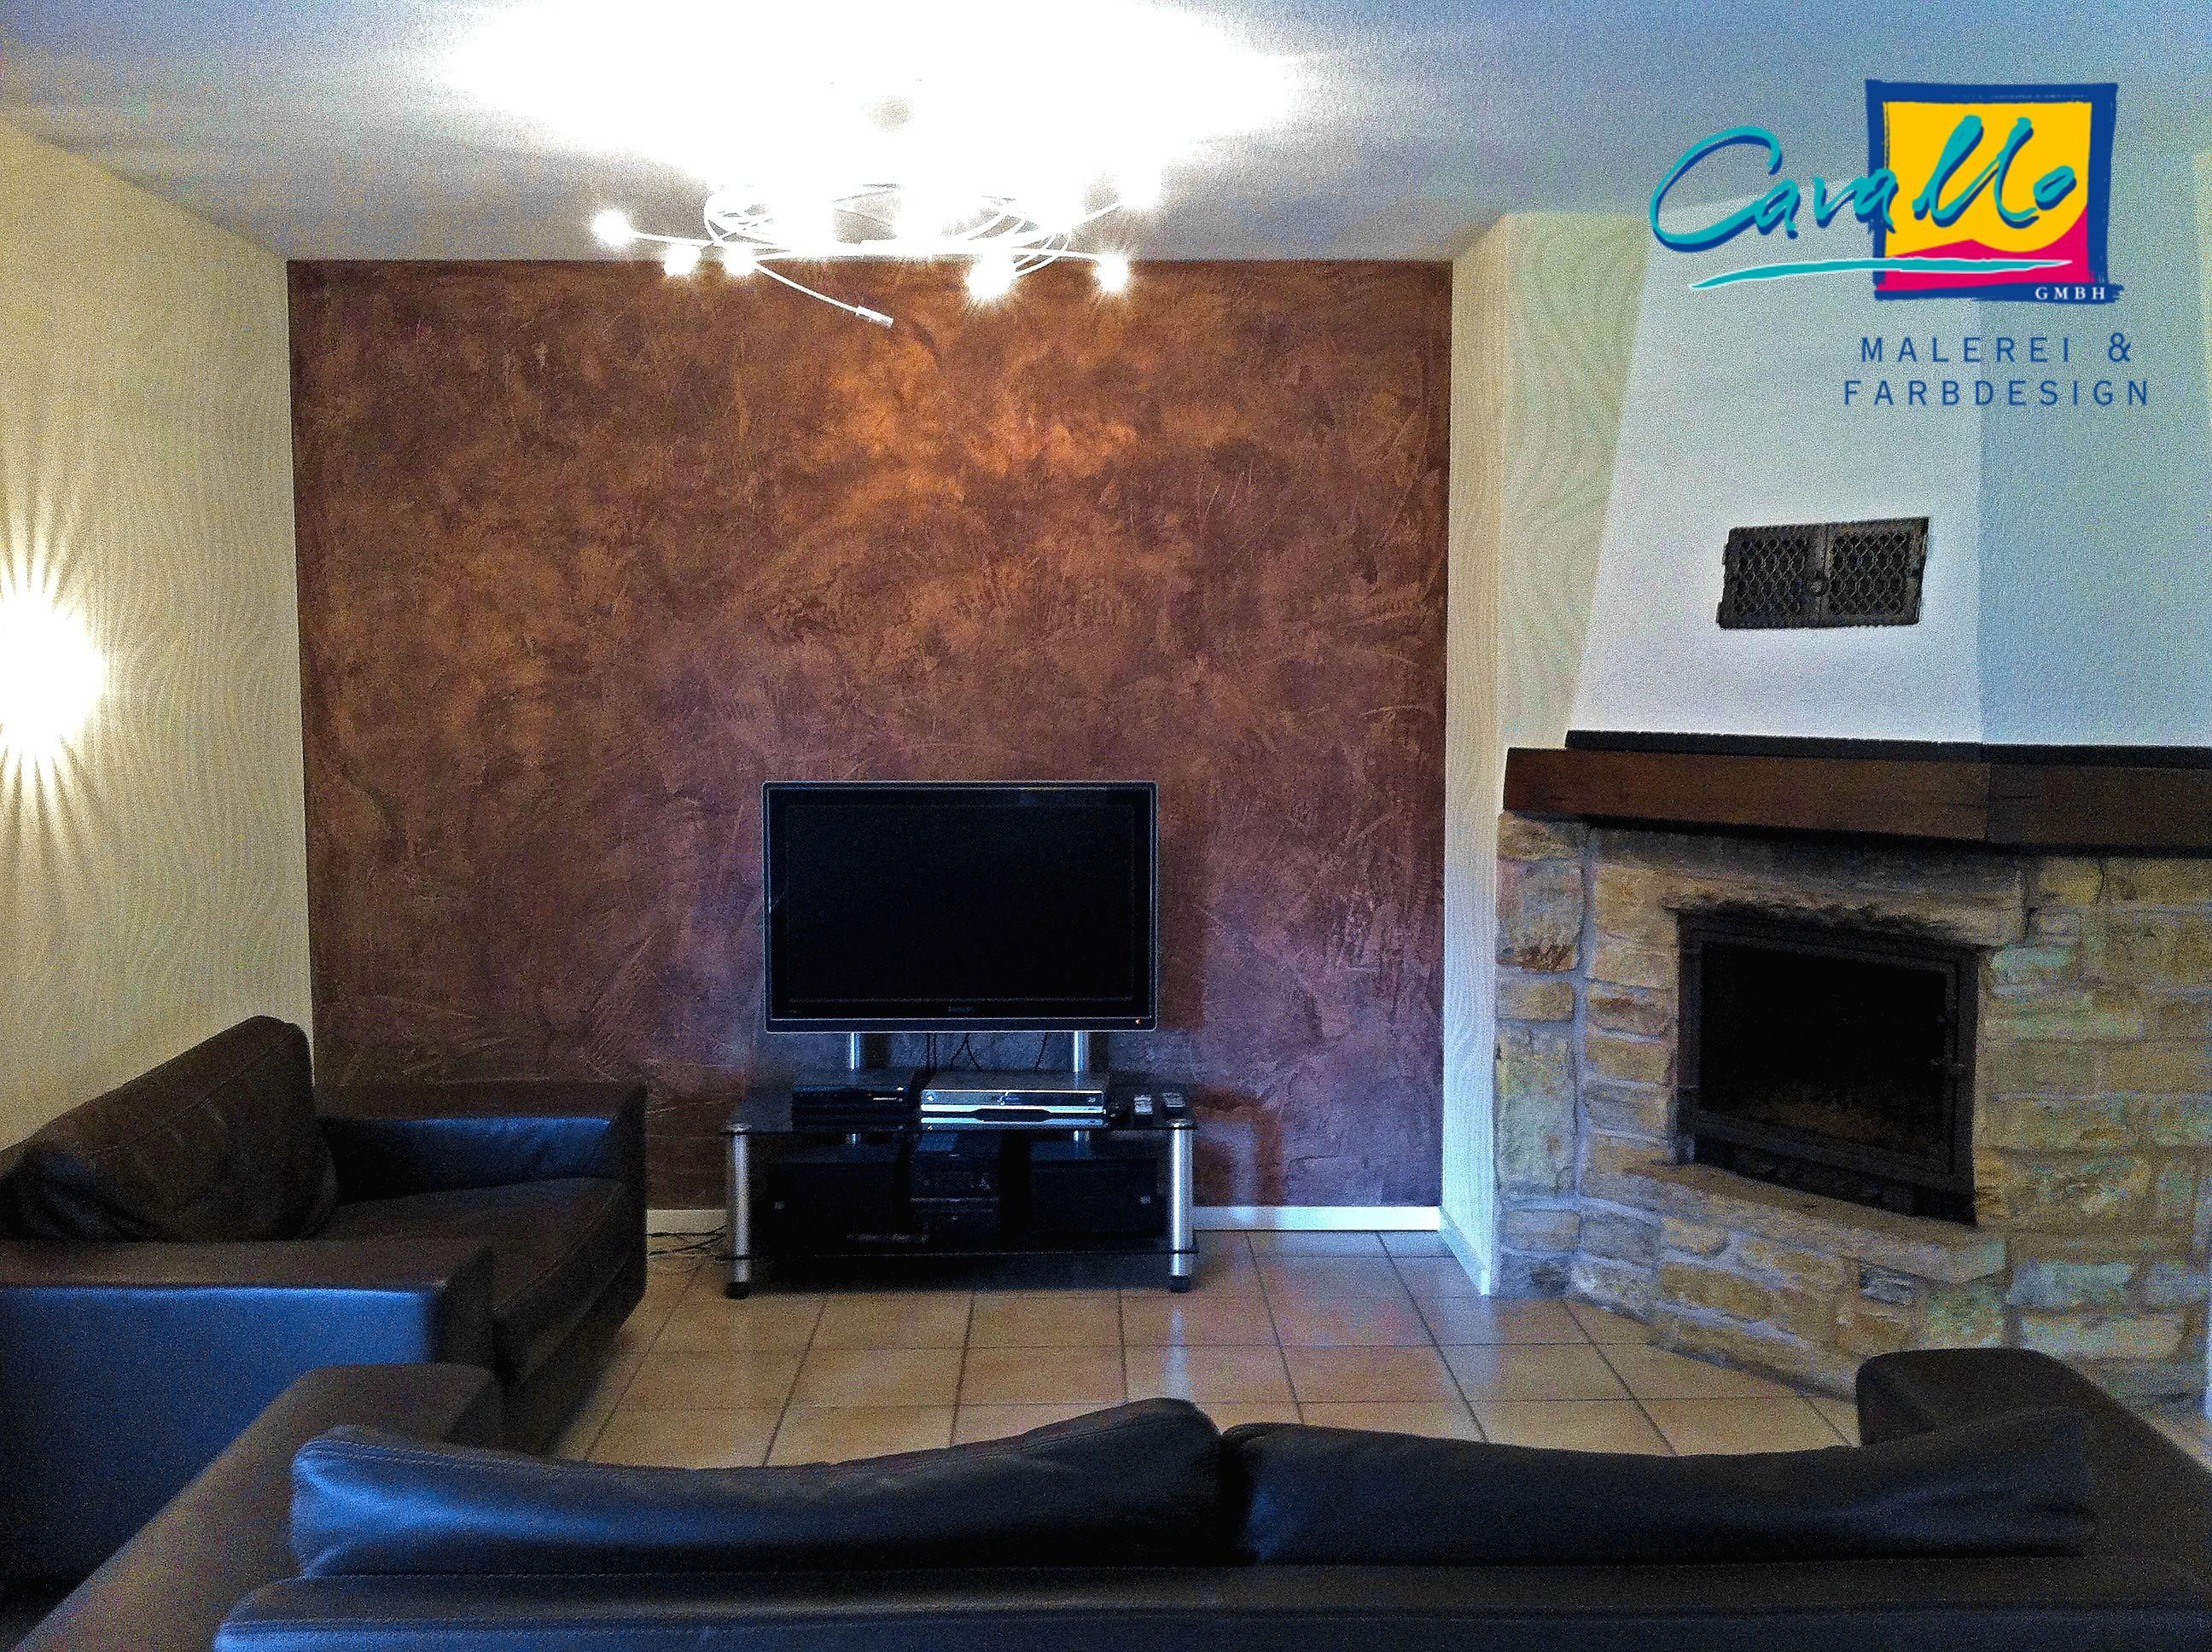 GroBartig #Edelputz #stucco #pompeji #Wandgestaltung #Walldesign #design #Wohnzimmer  #Livingroom